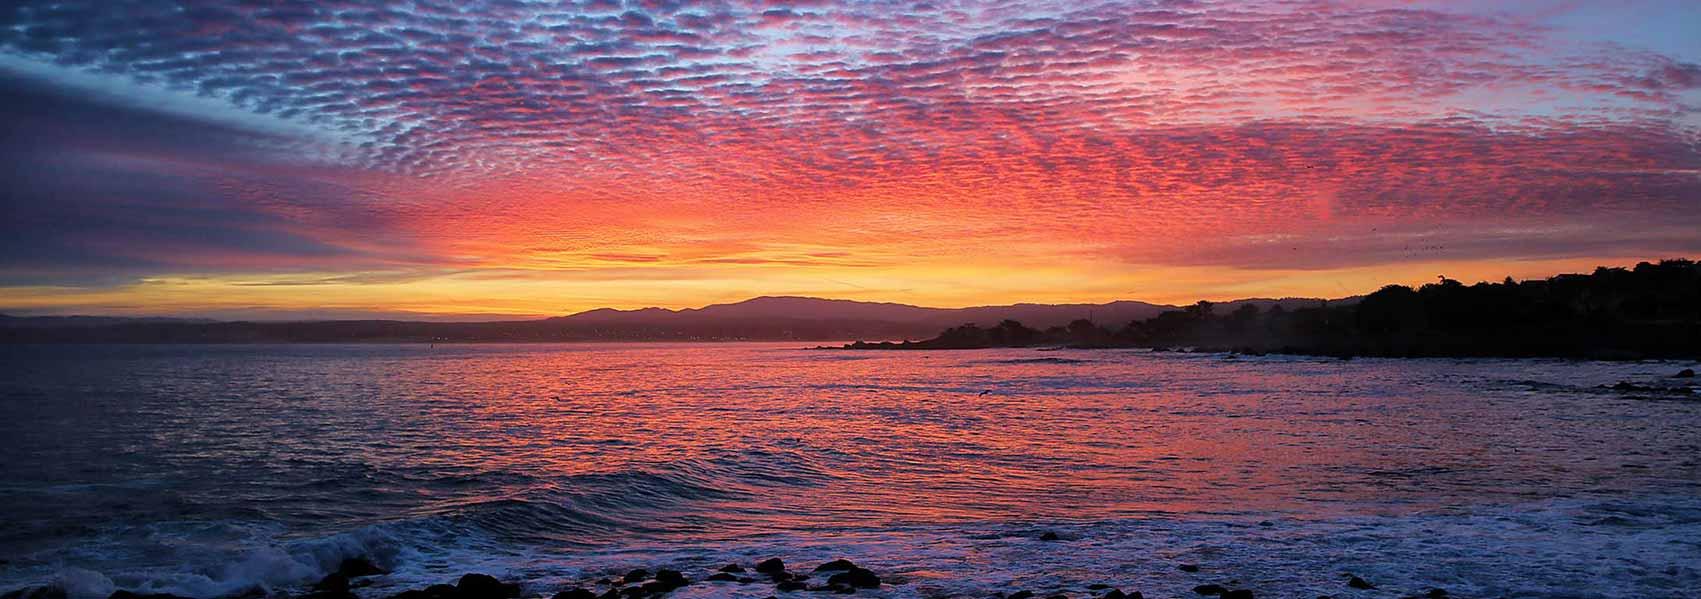 Cla_Mia_Homepage_slider_sunset